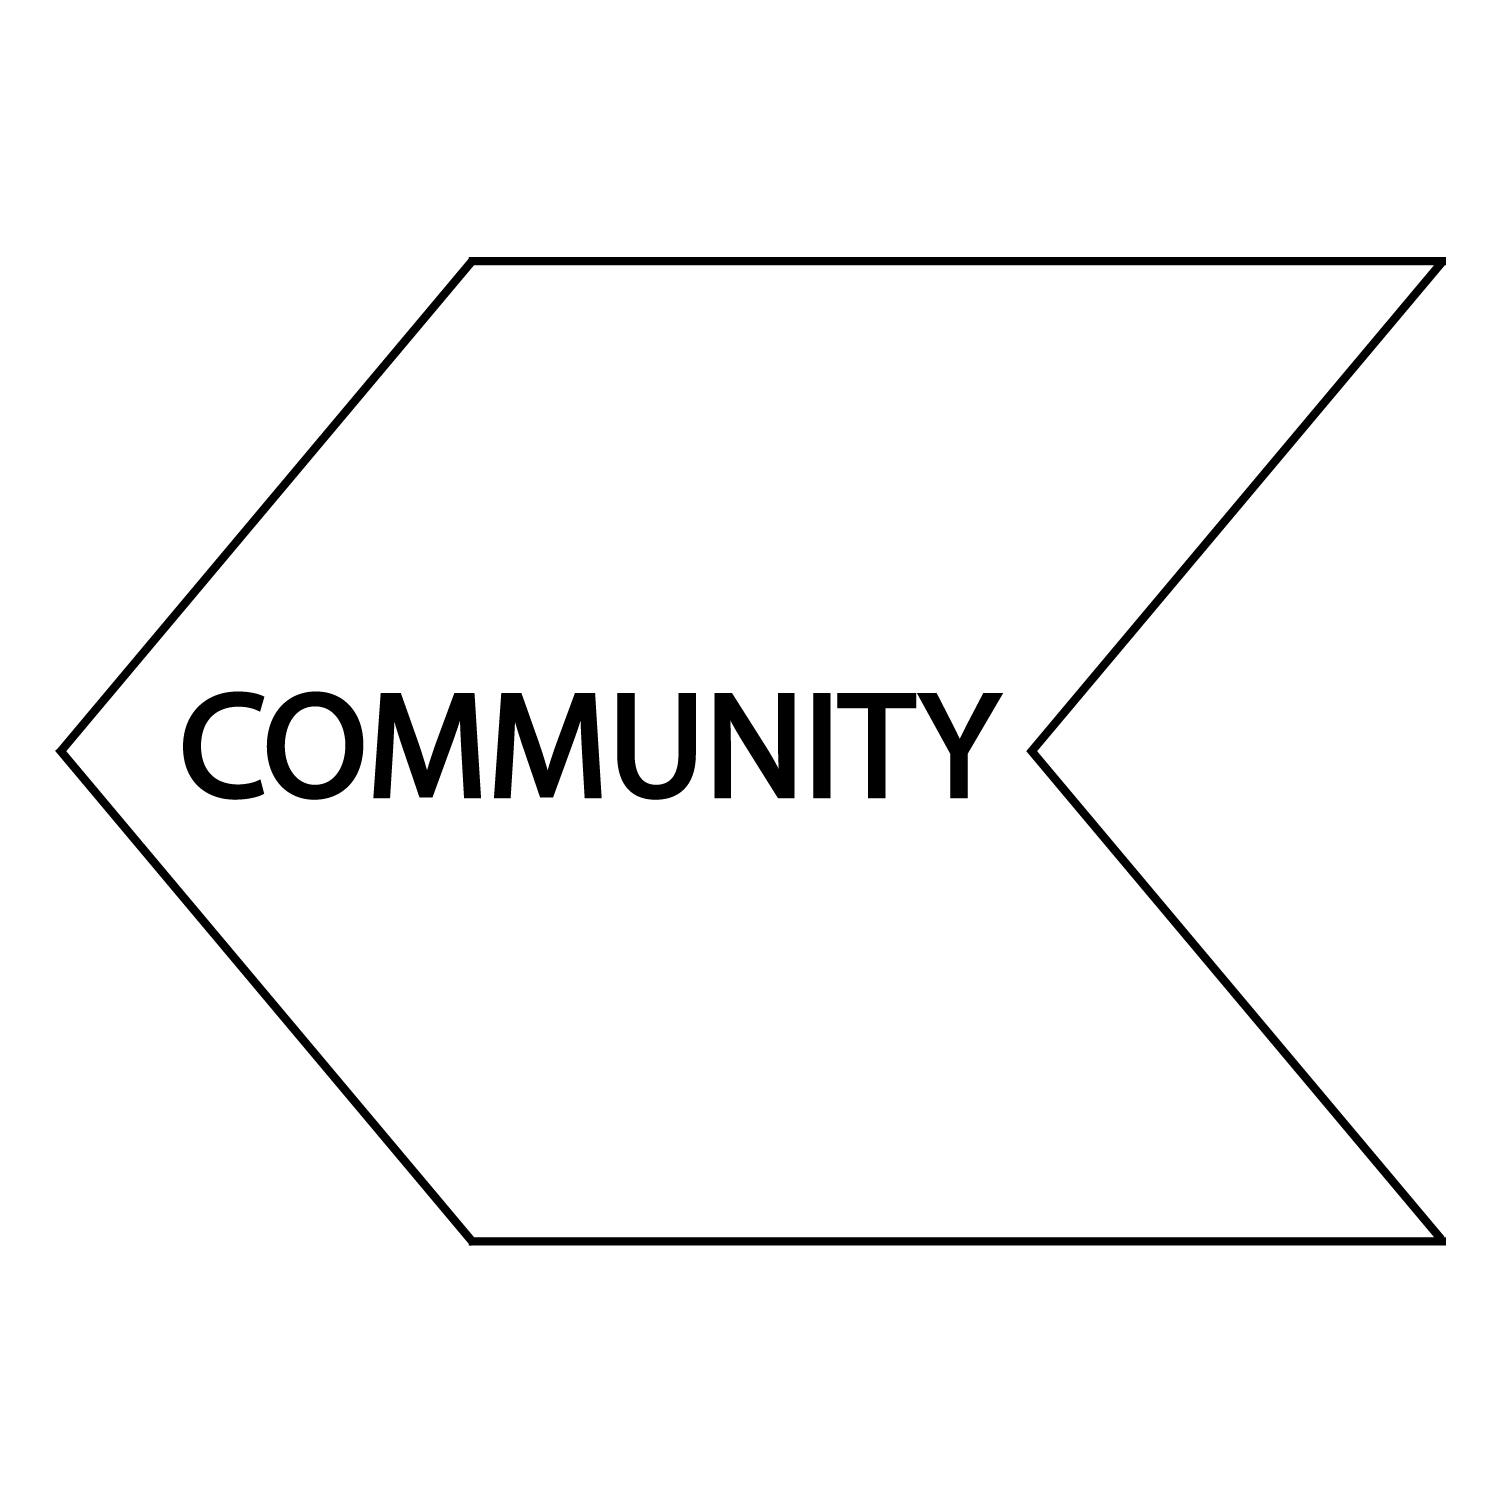 Community Arrow.jpg